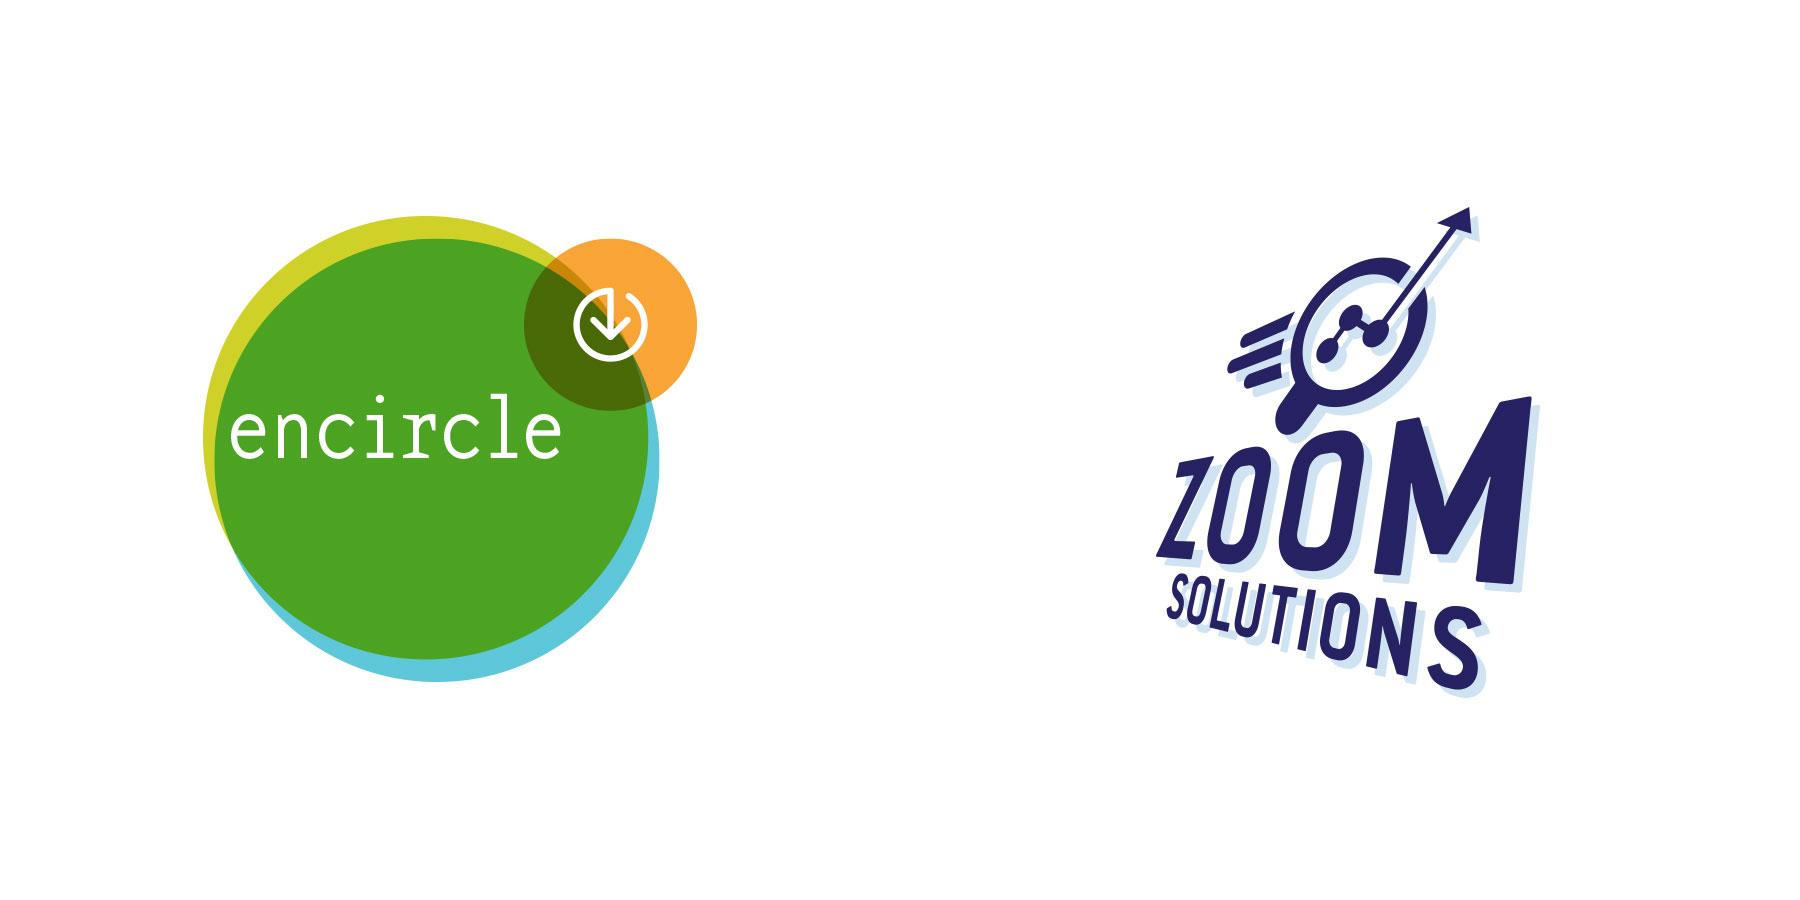 work_design_logo-5